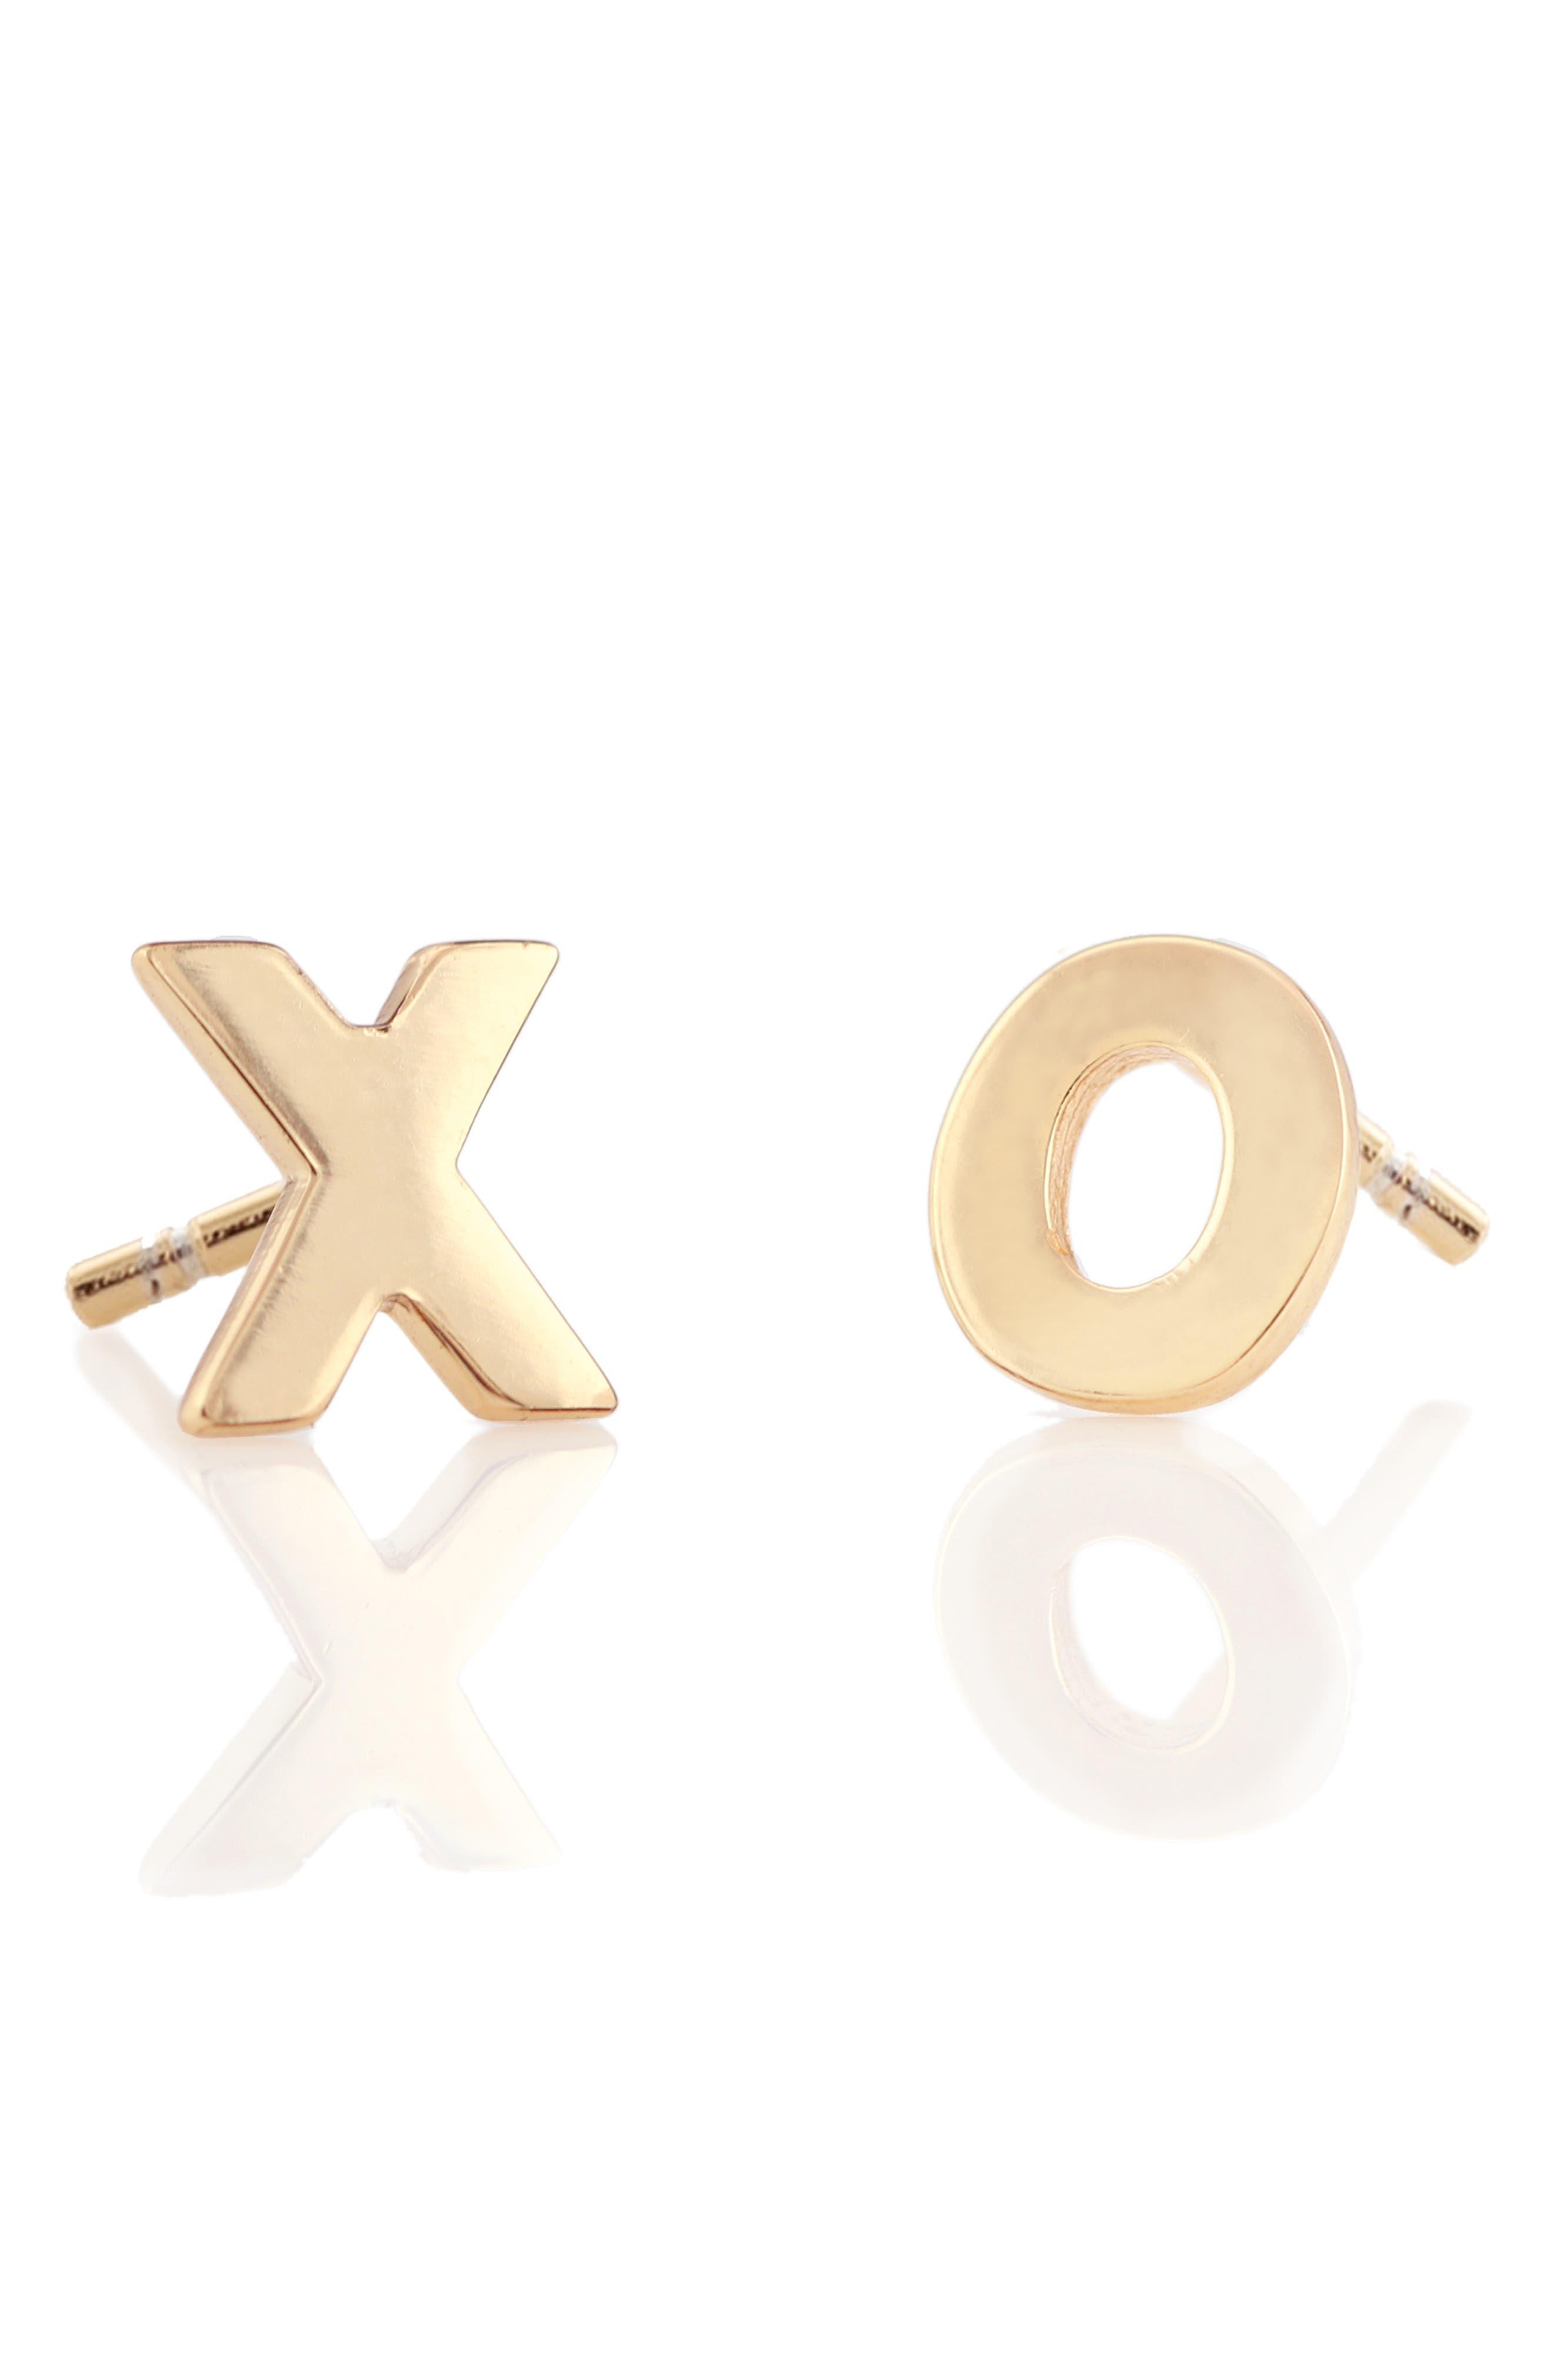 XO Stud Earrings,                         Main,                         color, GOLD